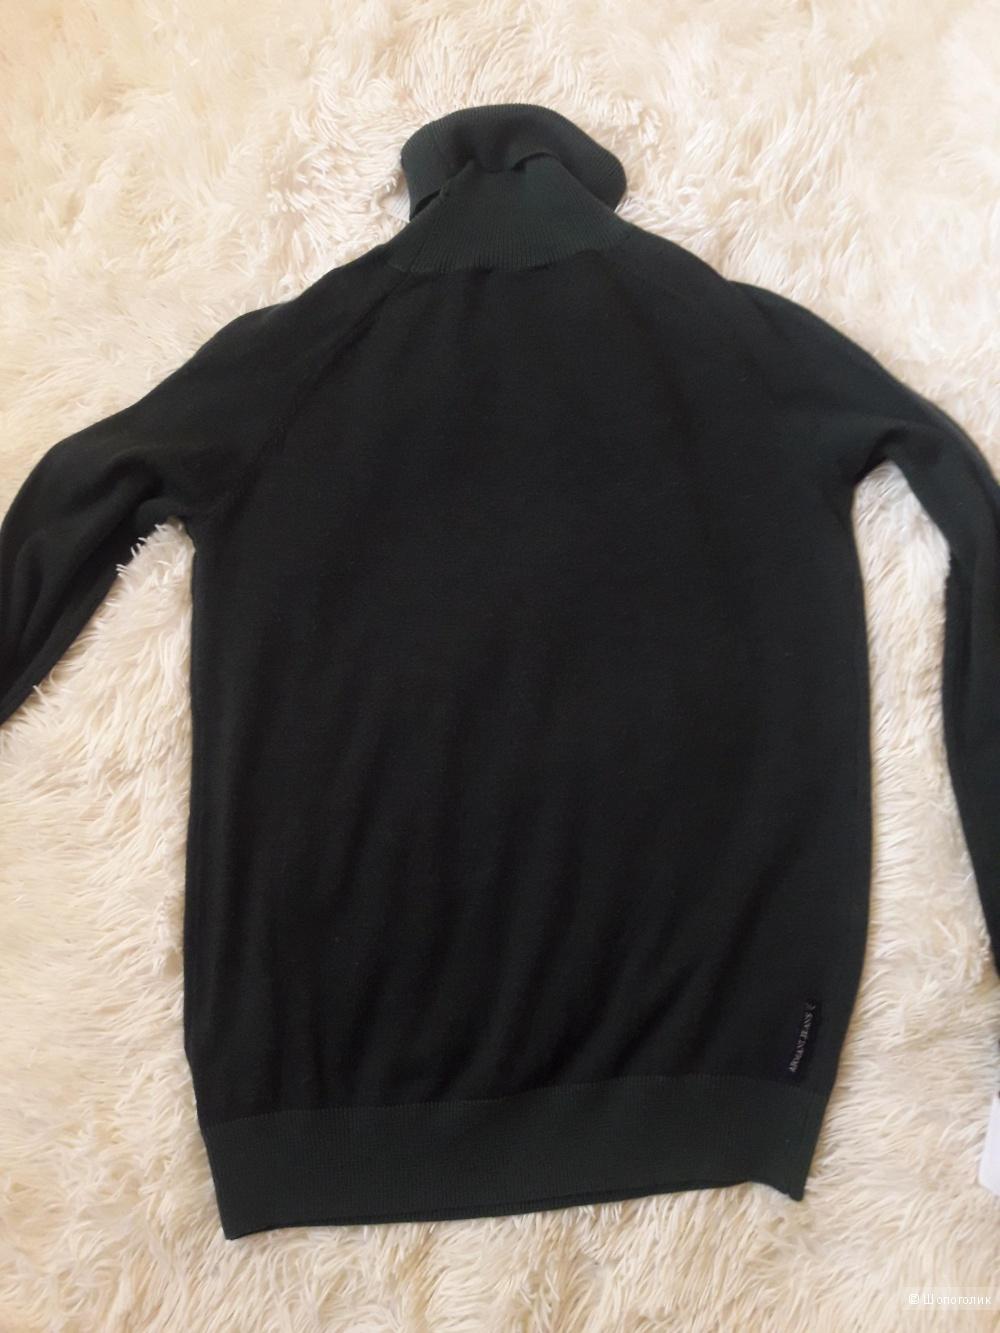 Джемпер Armani jeans, размер 42-44